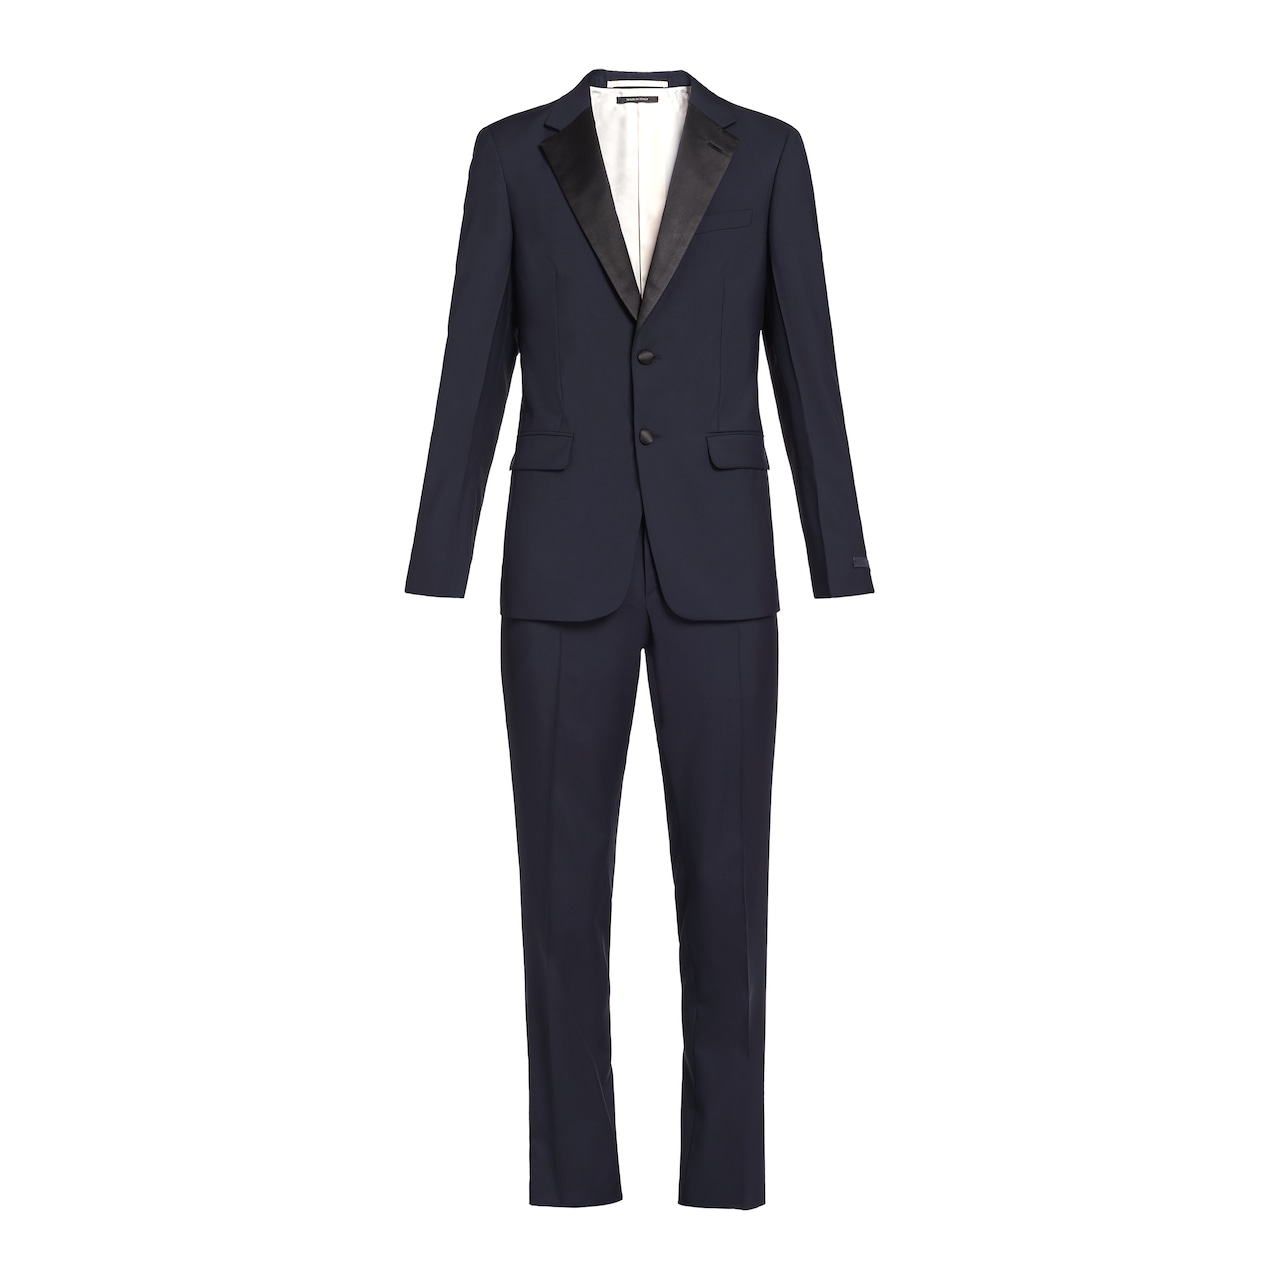 Prada Mohair and wool suit 1